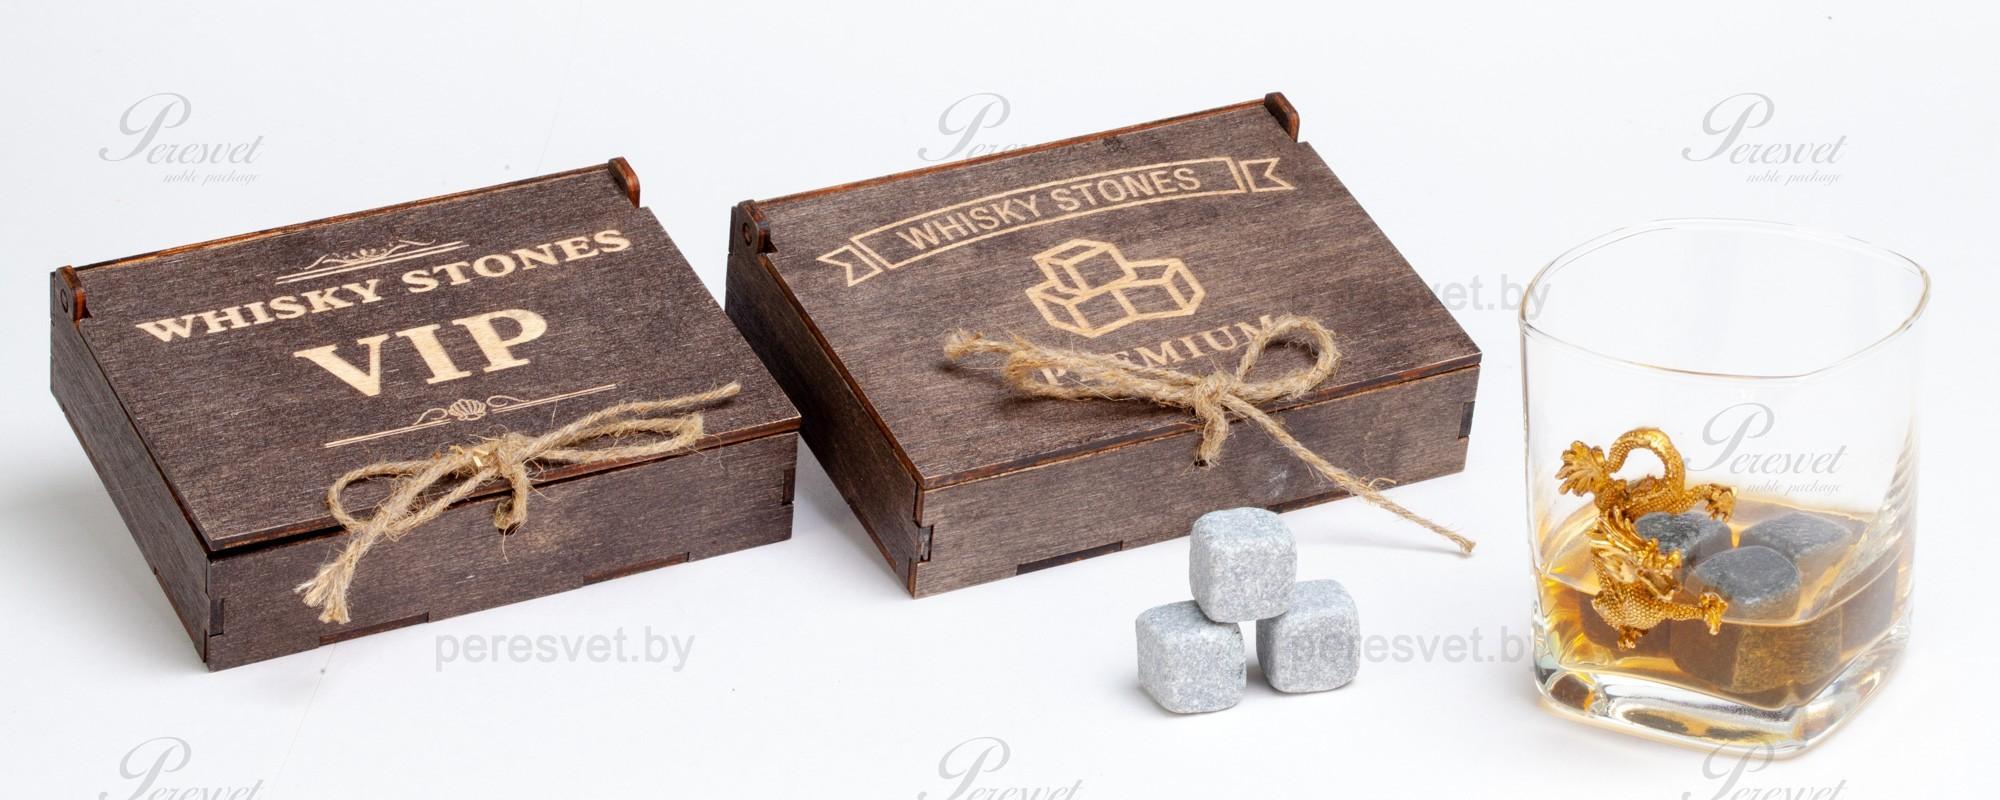 Камни Whiskey Stones для охлаждения напитков в деревянном коробке на peresvet.by